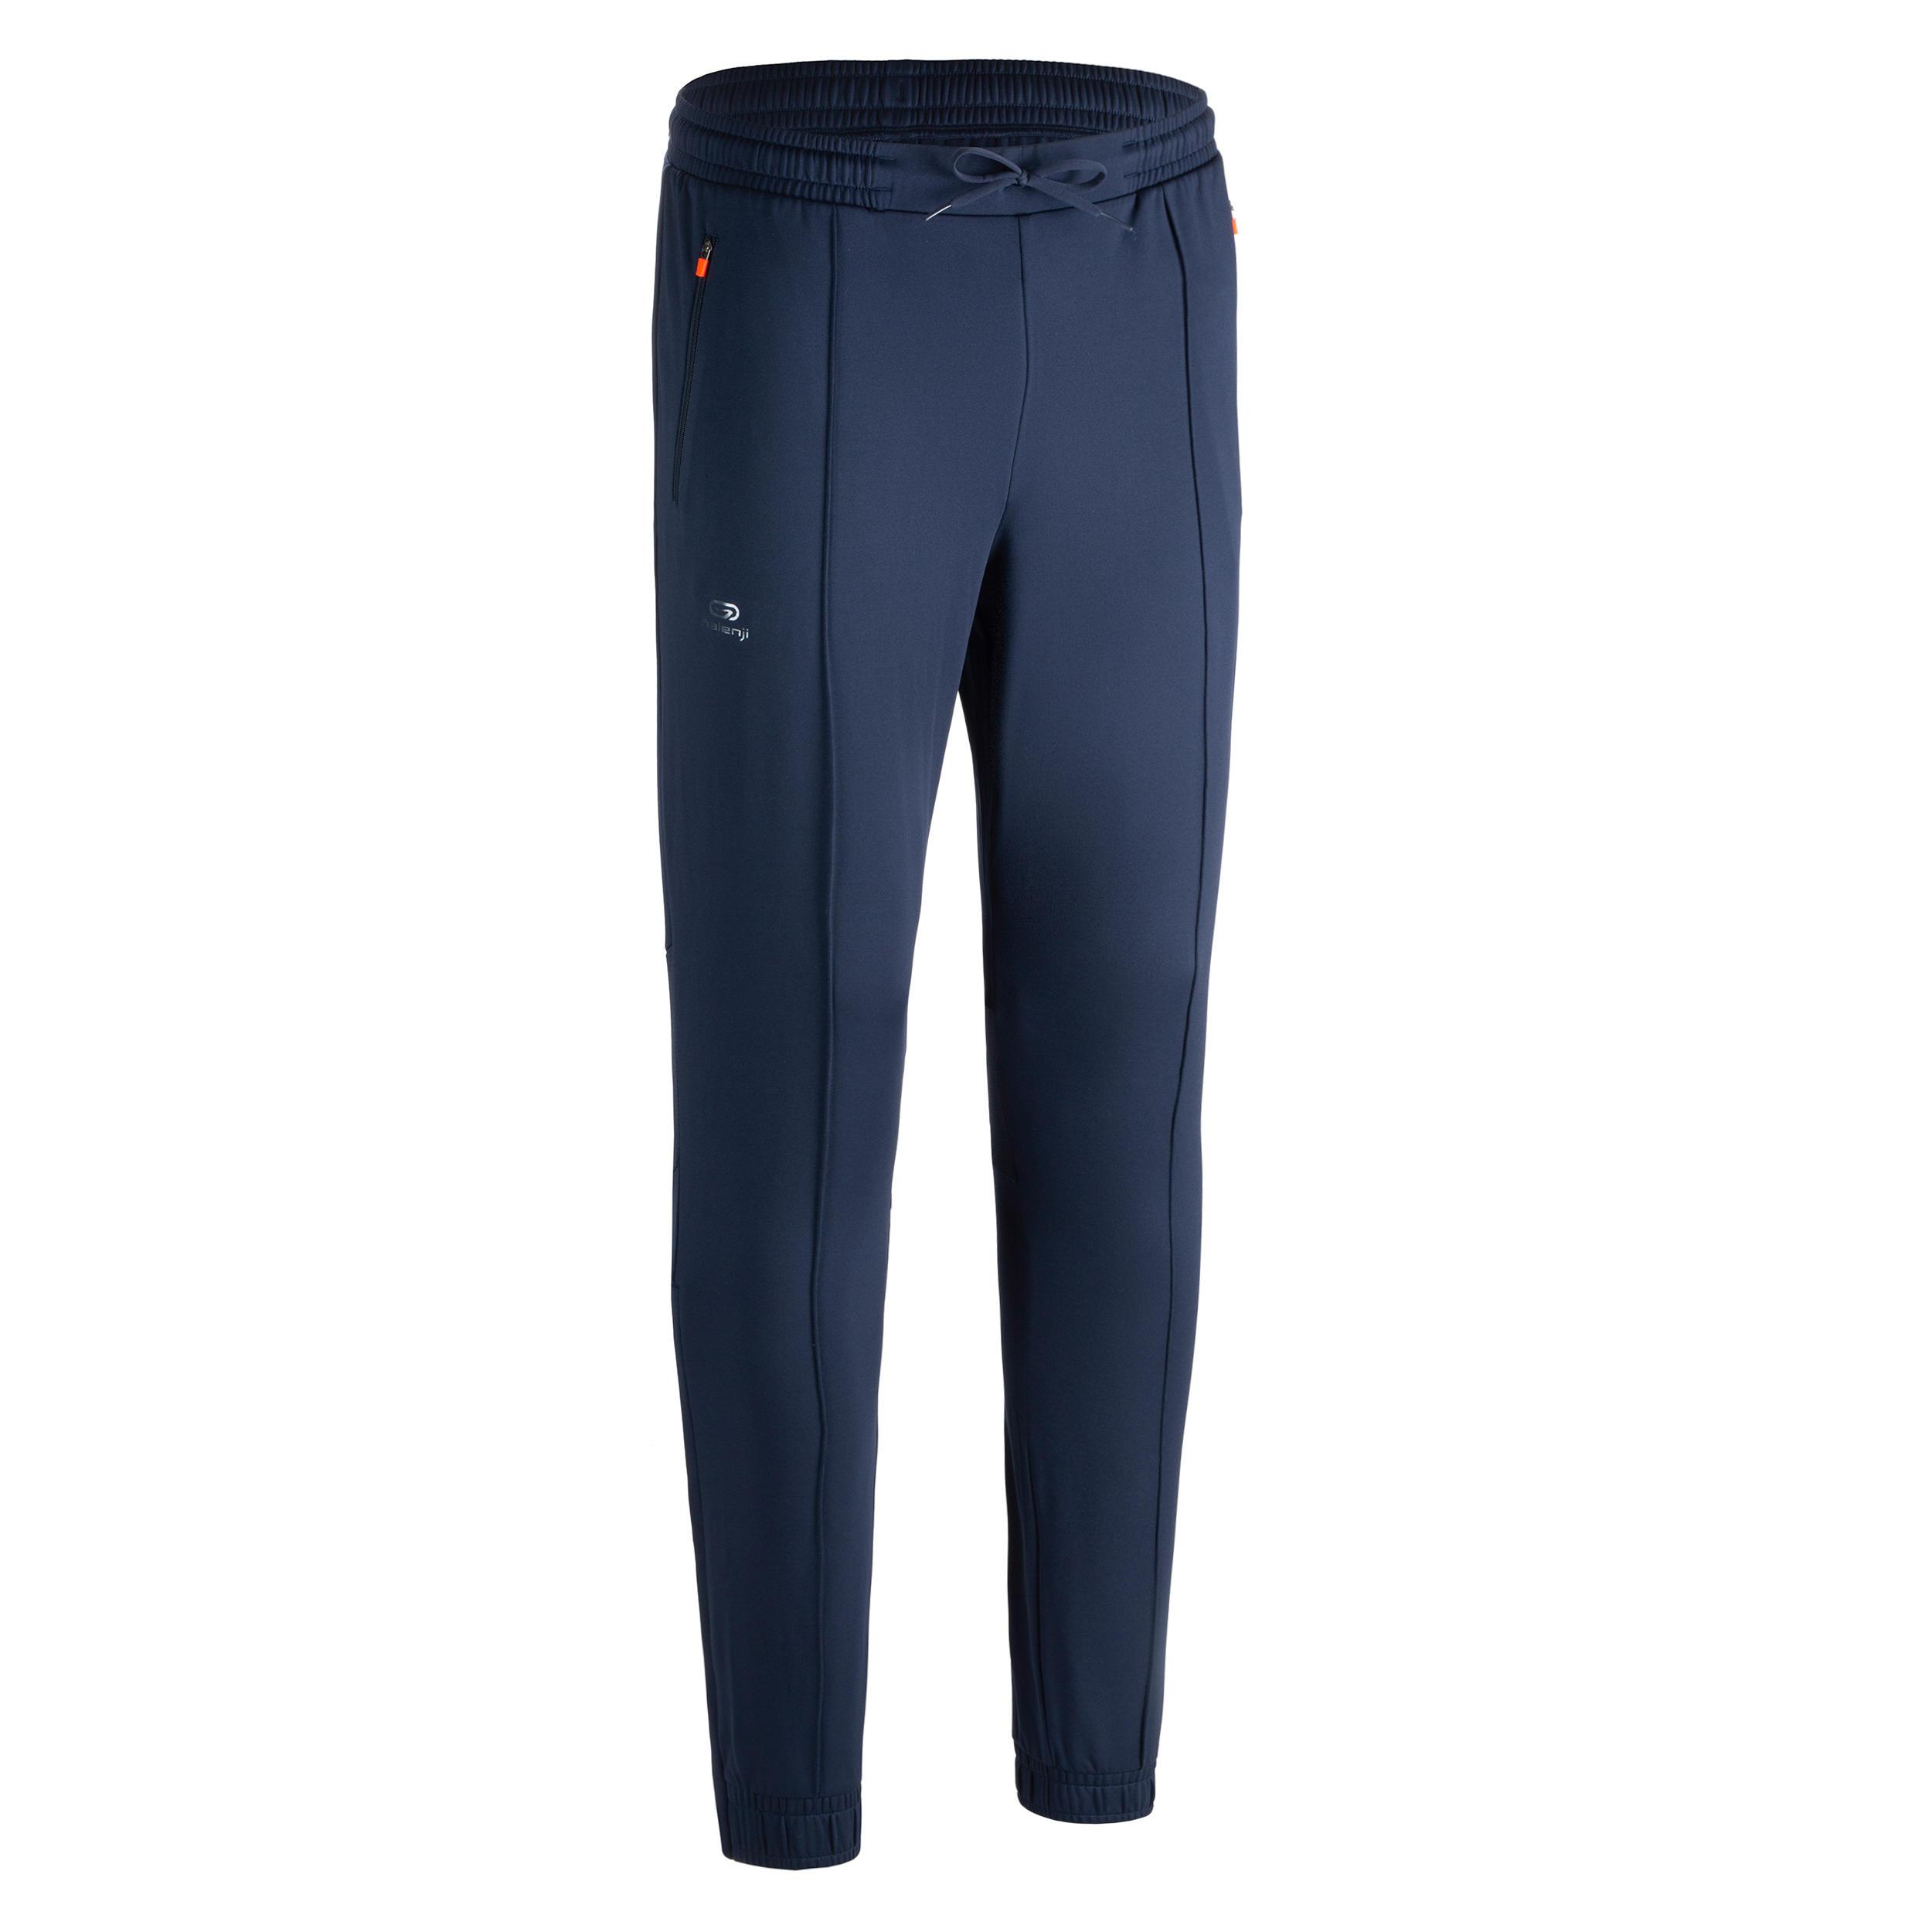 Pantalon Atletism AT PANT 900m imagine